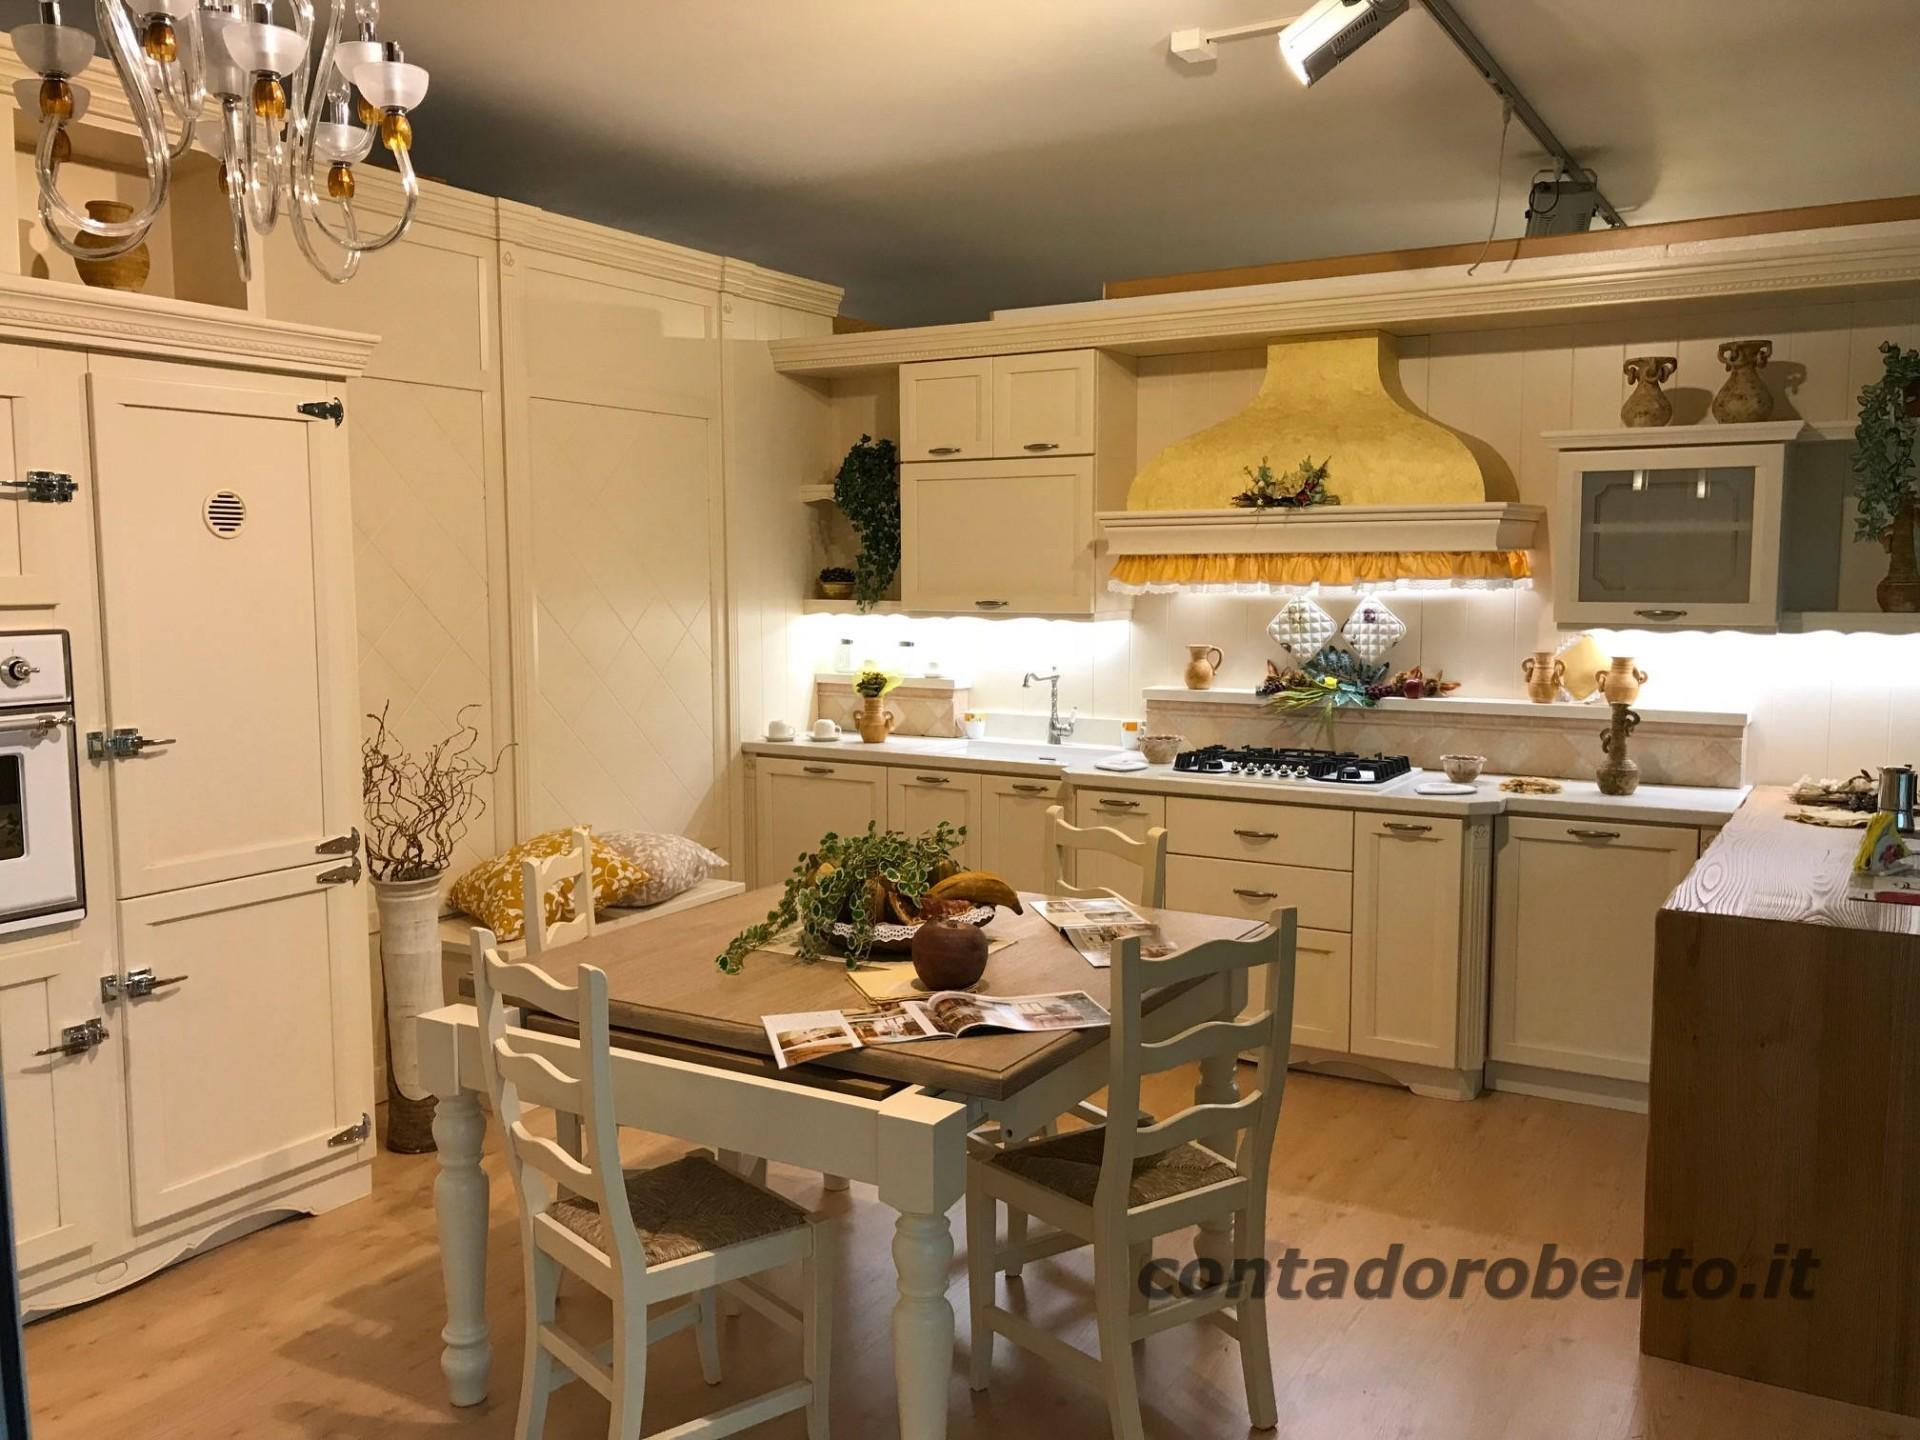 cucina-country-artigianale-in-legno-country-chic.jpg